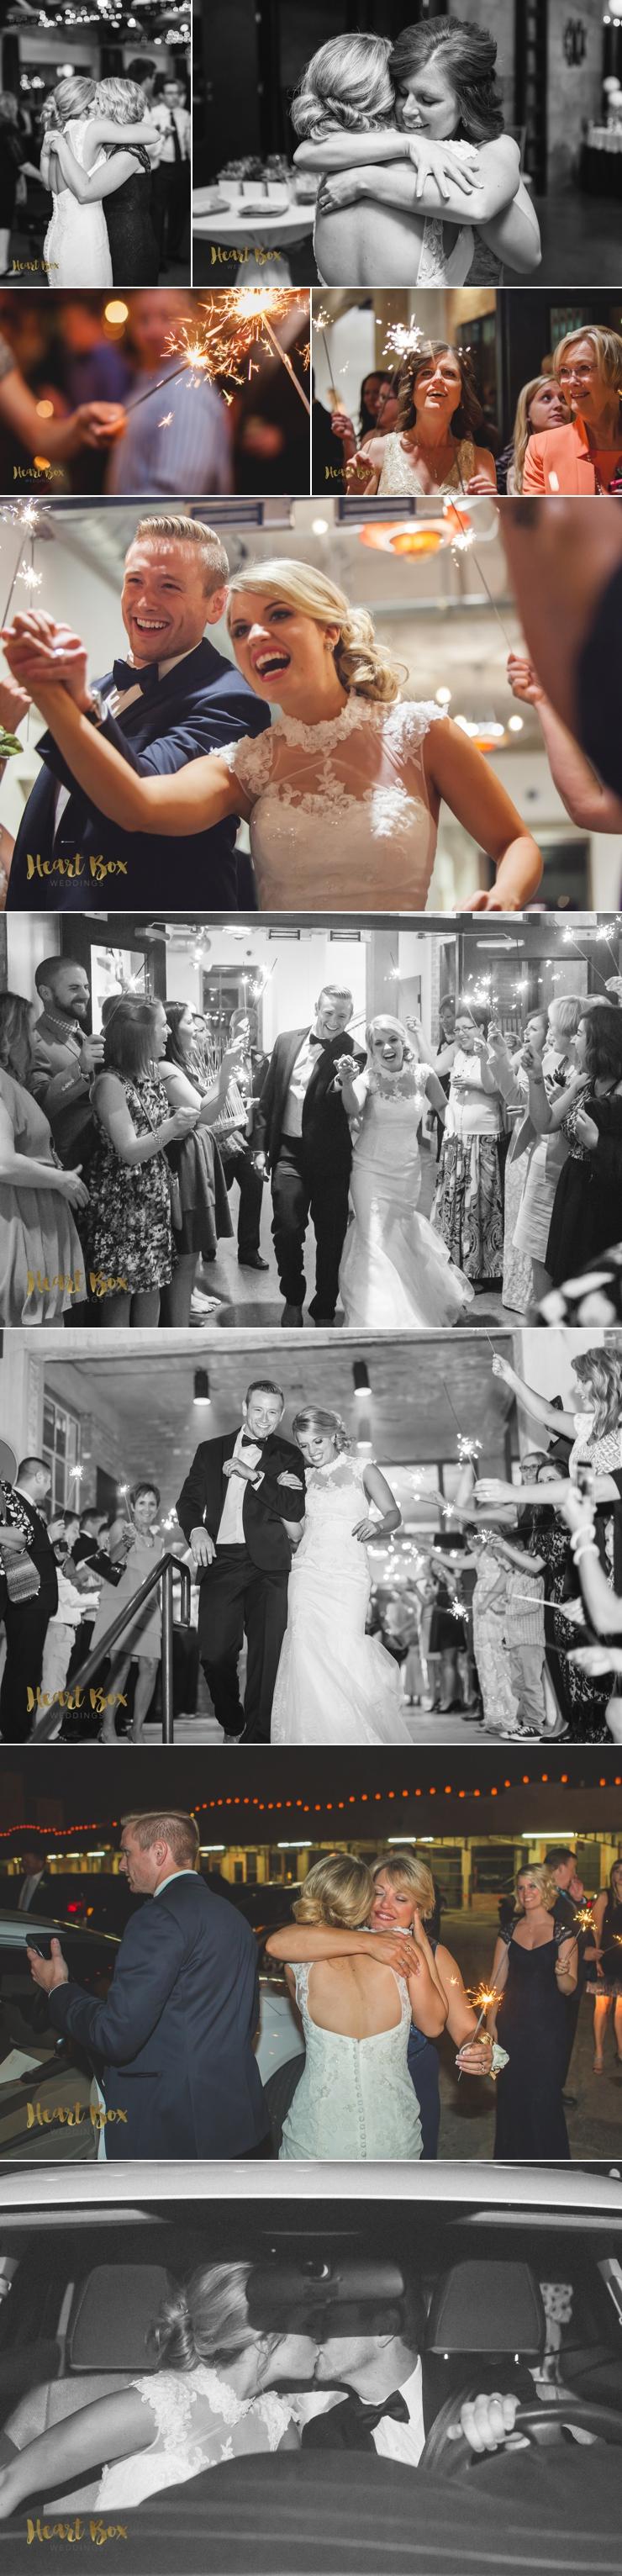 Mabry Wedding 25.jpg